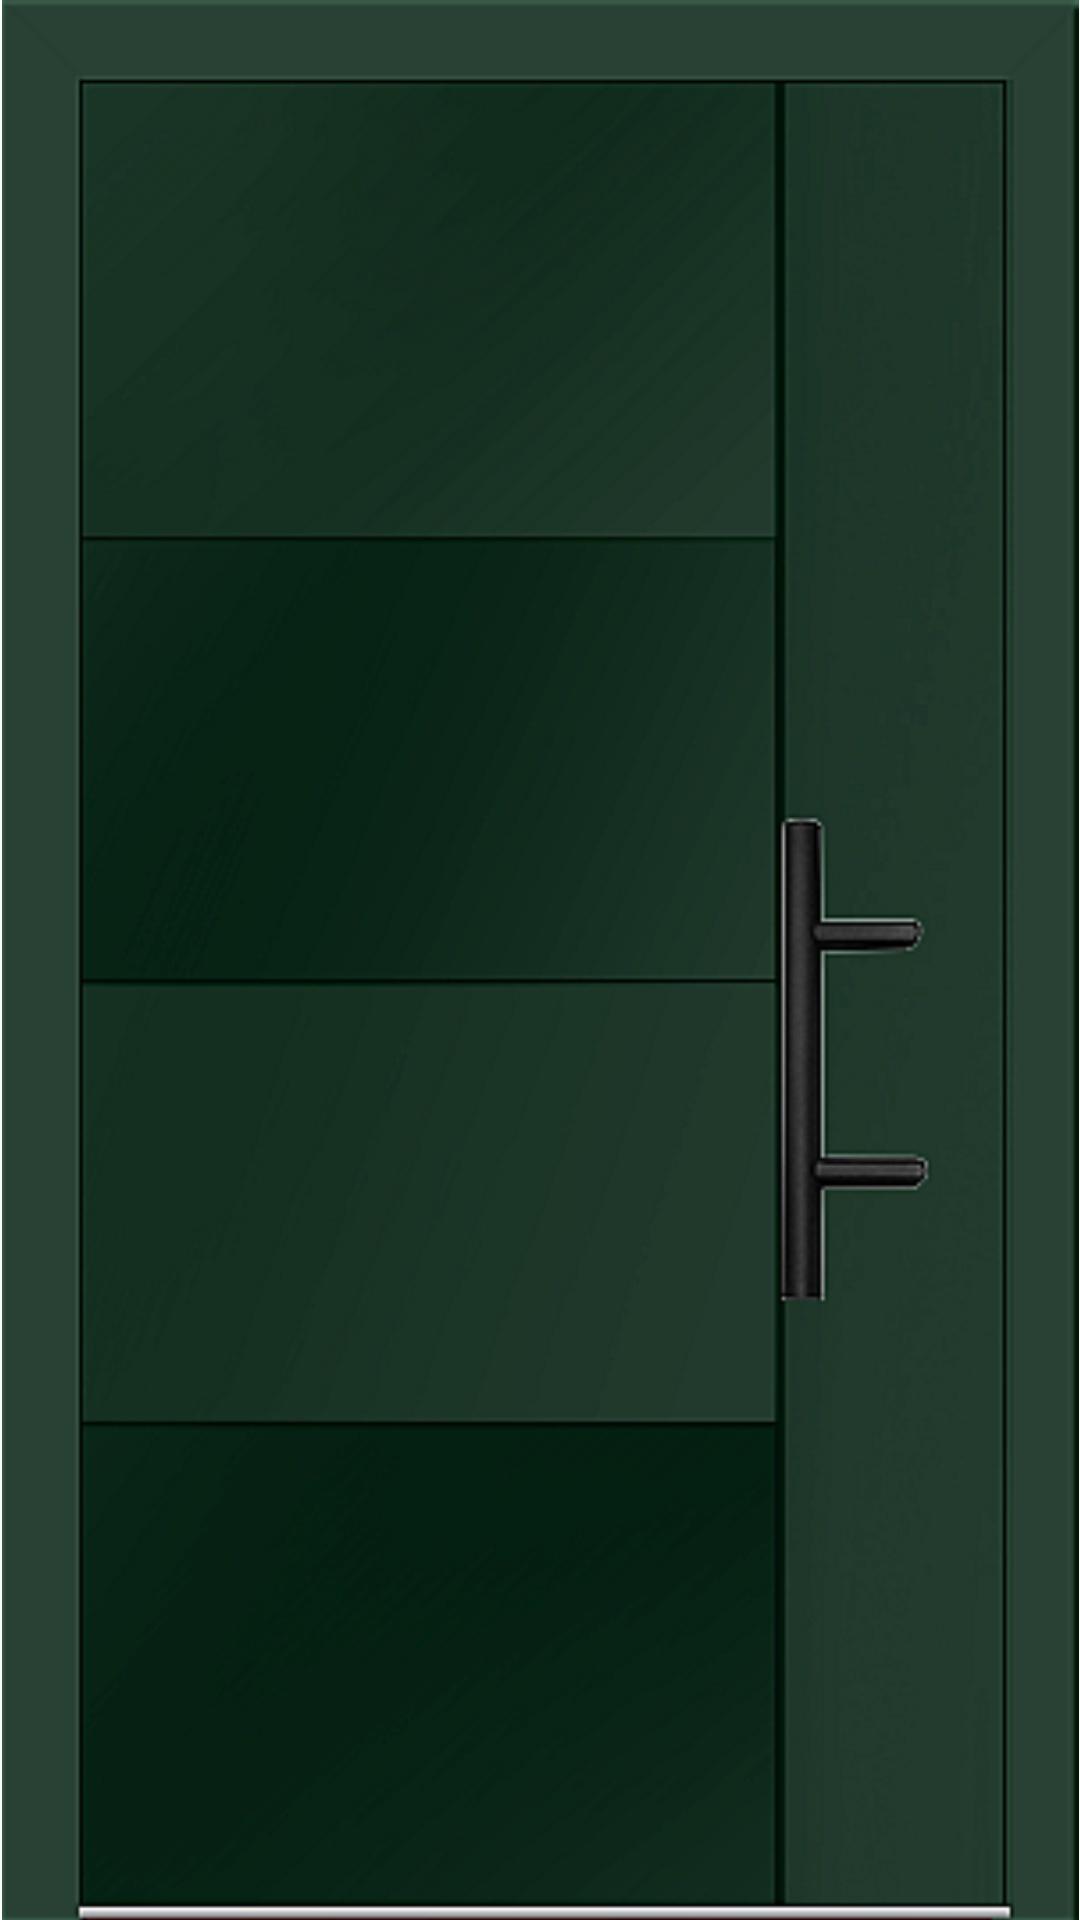 Holz-Alu Haustür Modell 66874 moosgrün